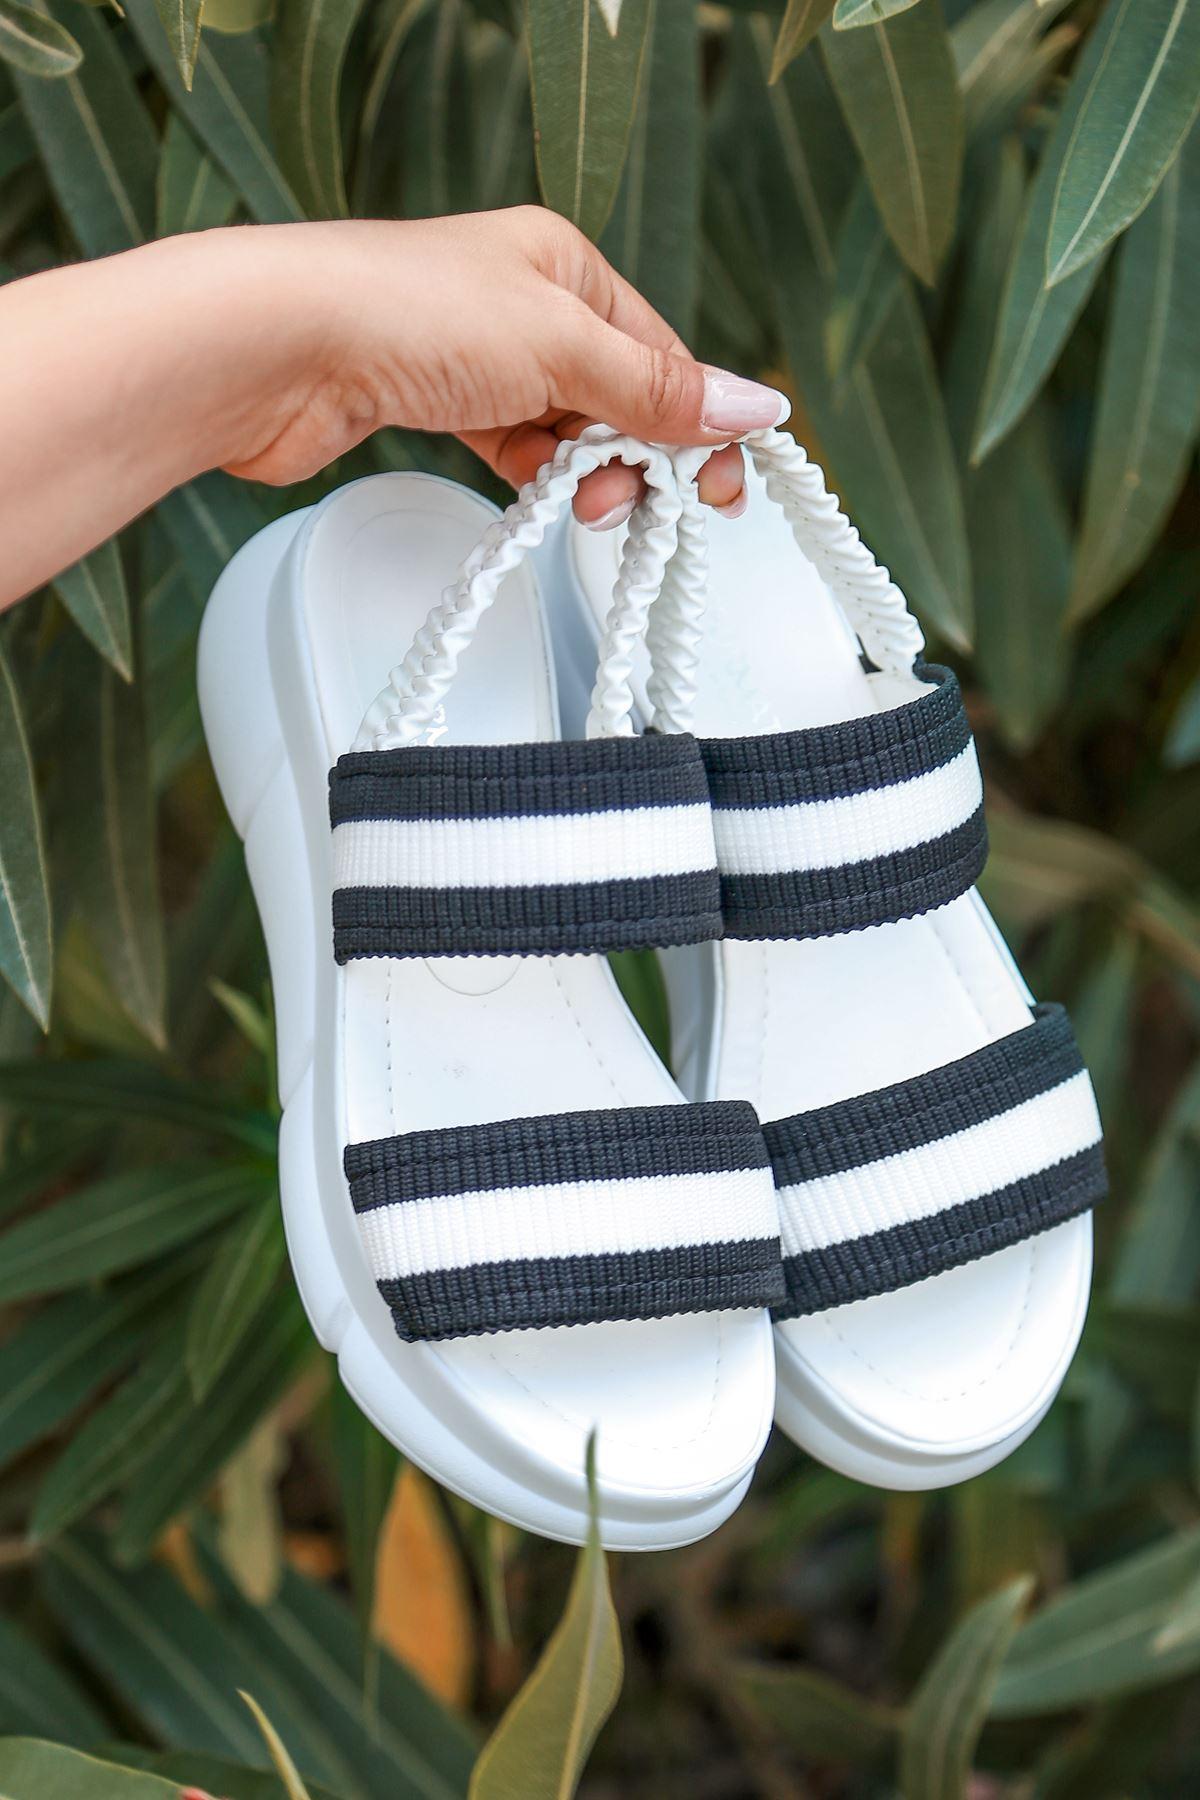 Shine Triko Sandalet Beyaz